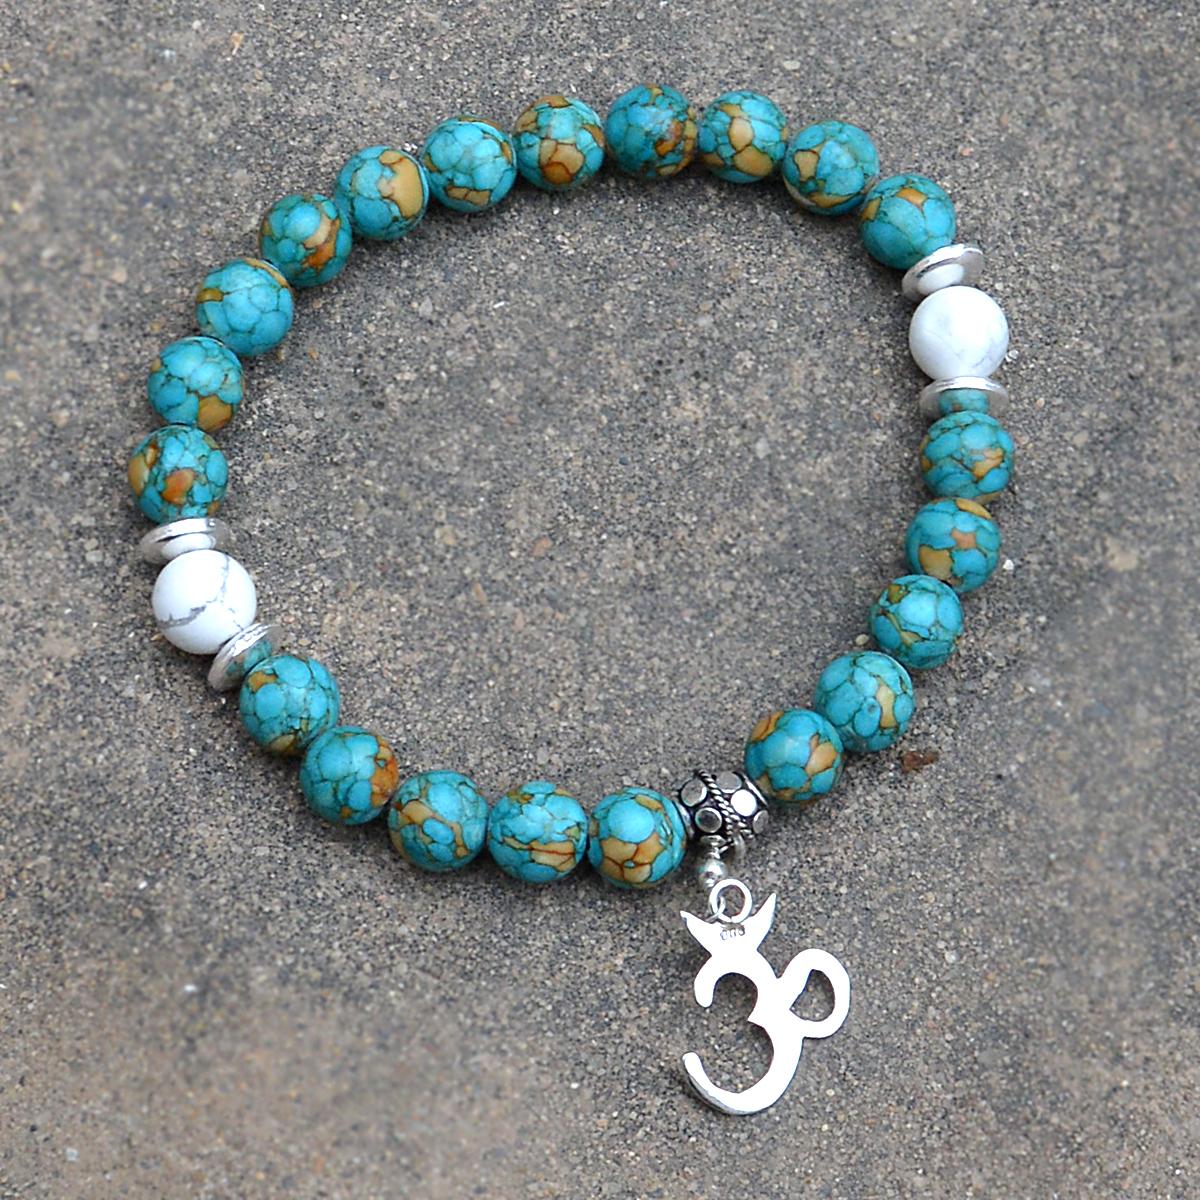 Turquoise & Howlite Gemstone Bracelet PG-156018